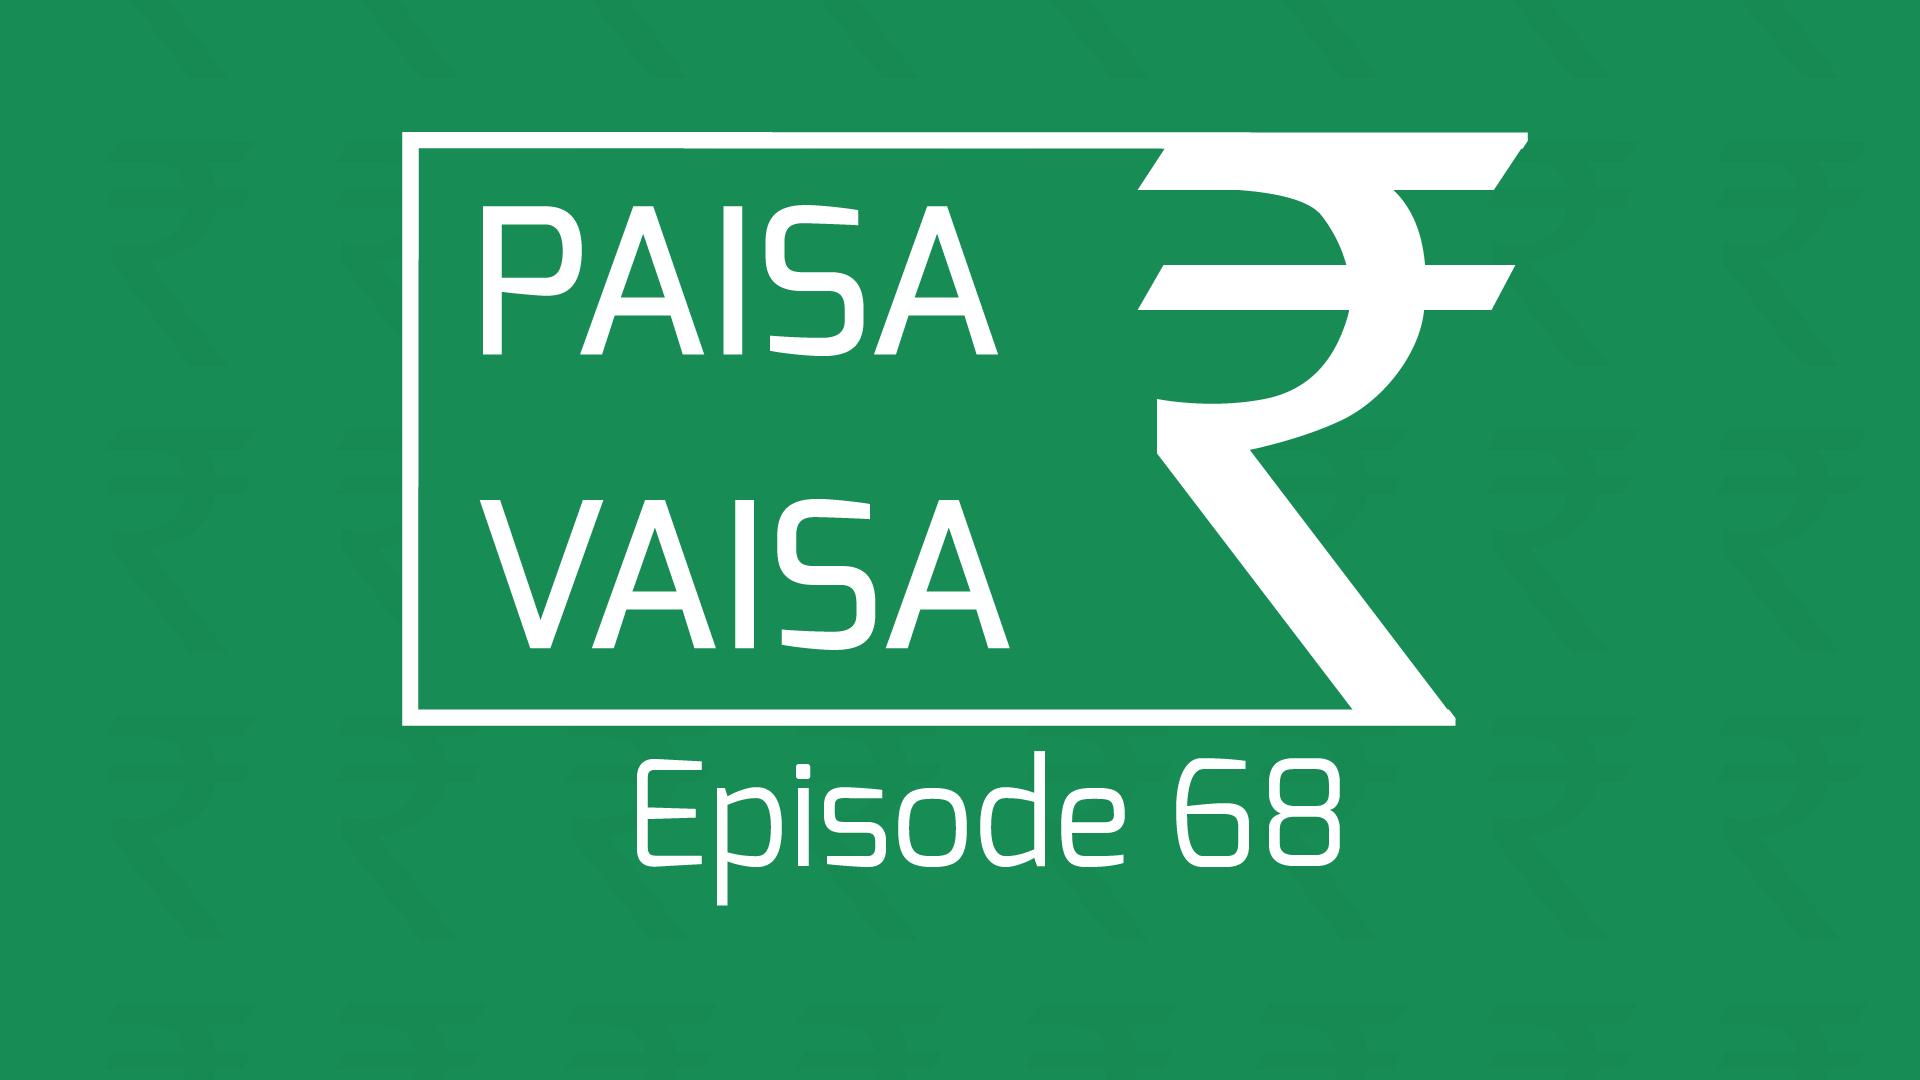 PaisaVaisaEpisode68.png